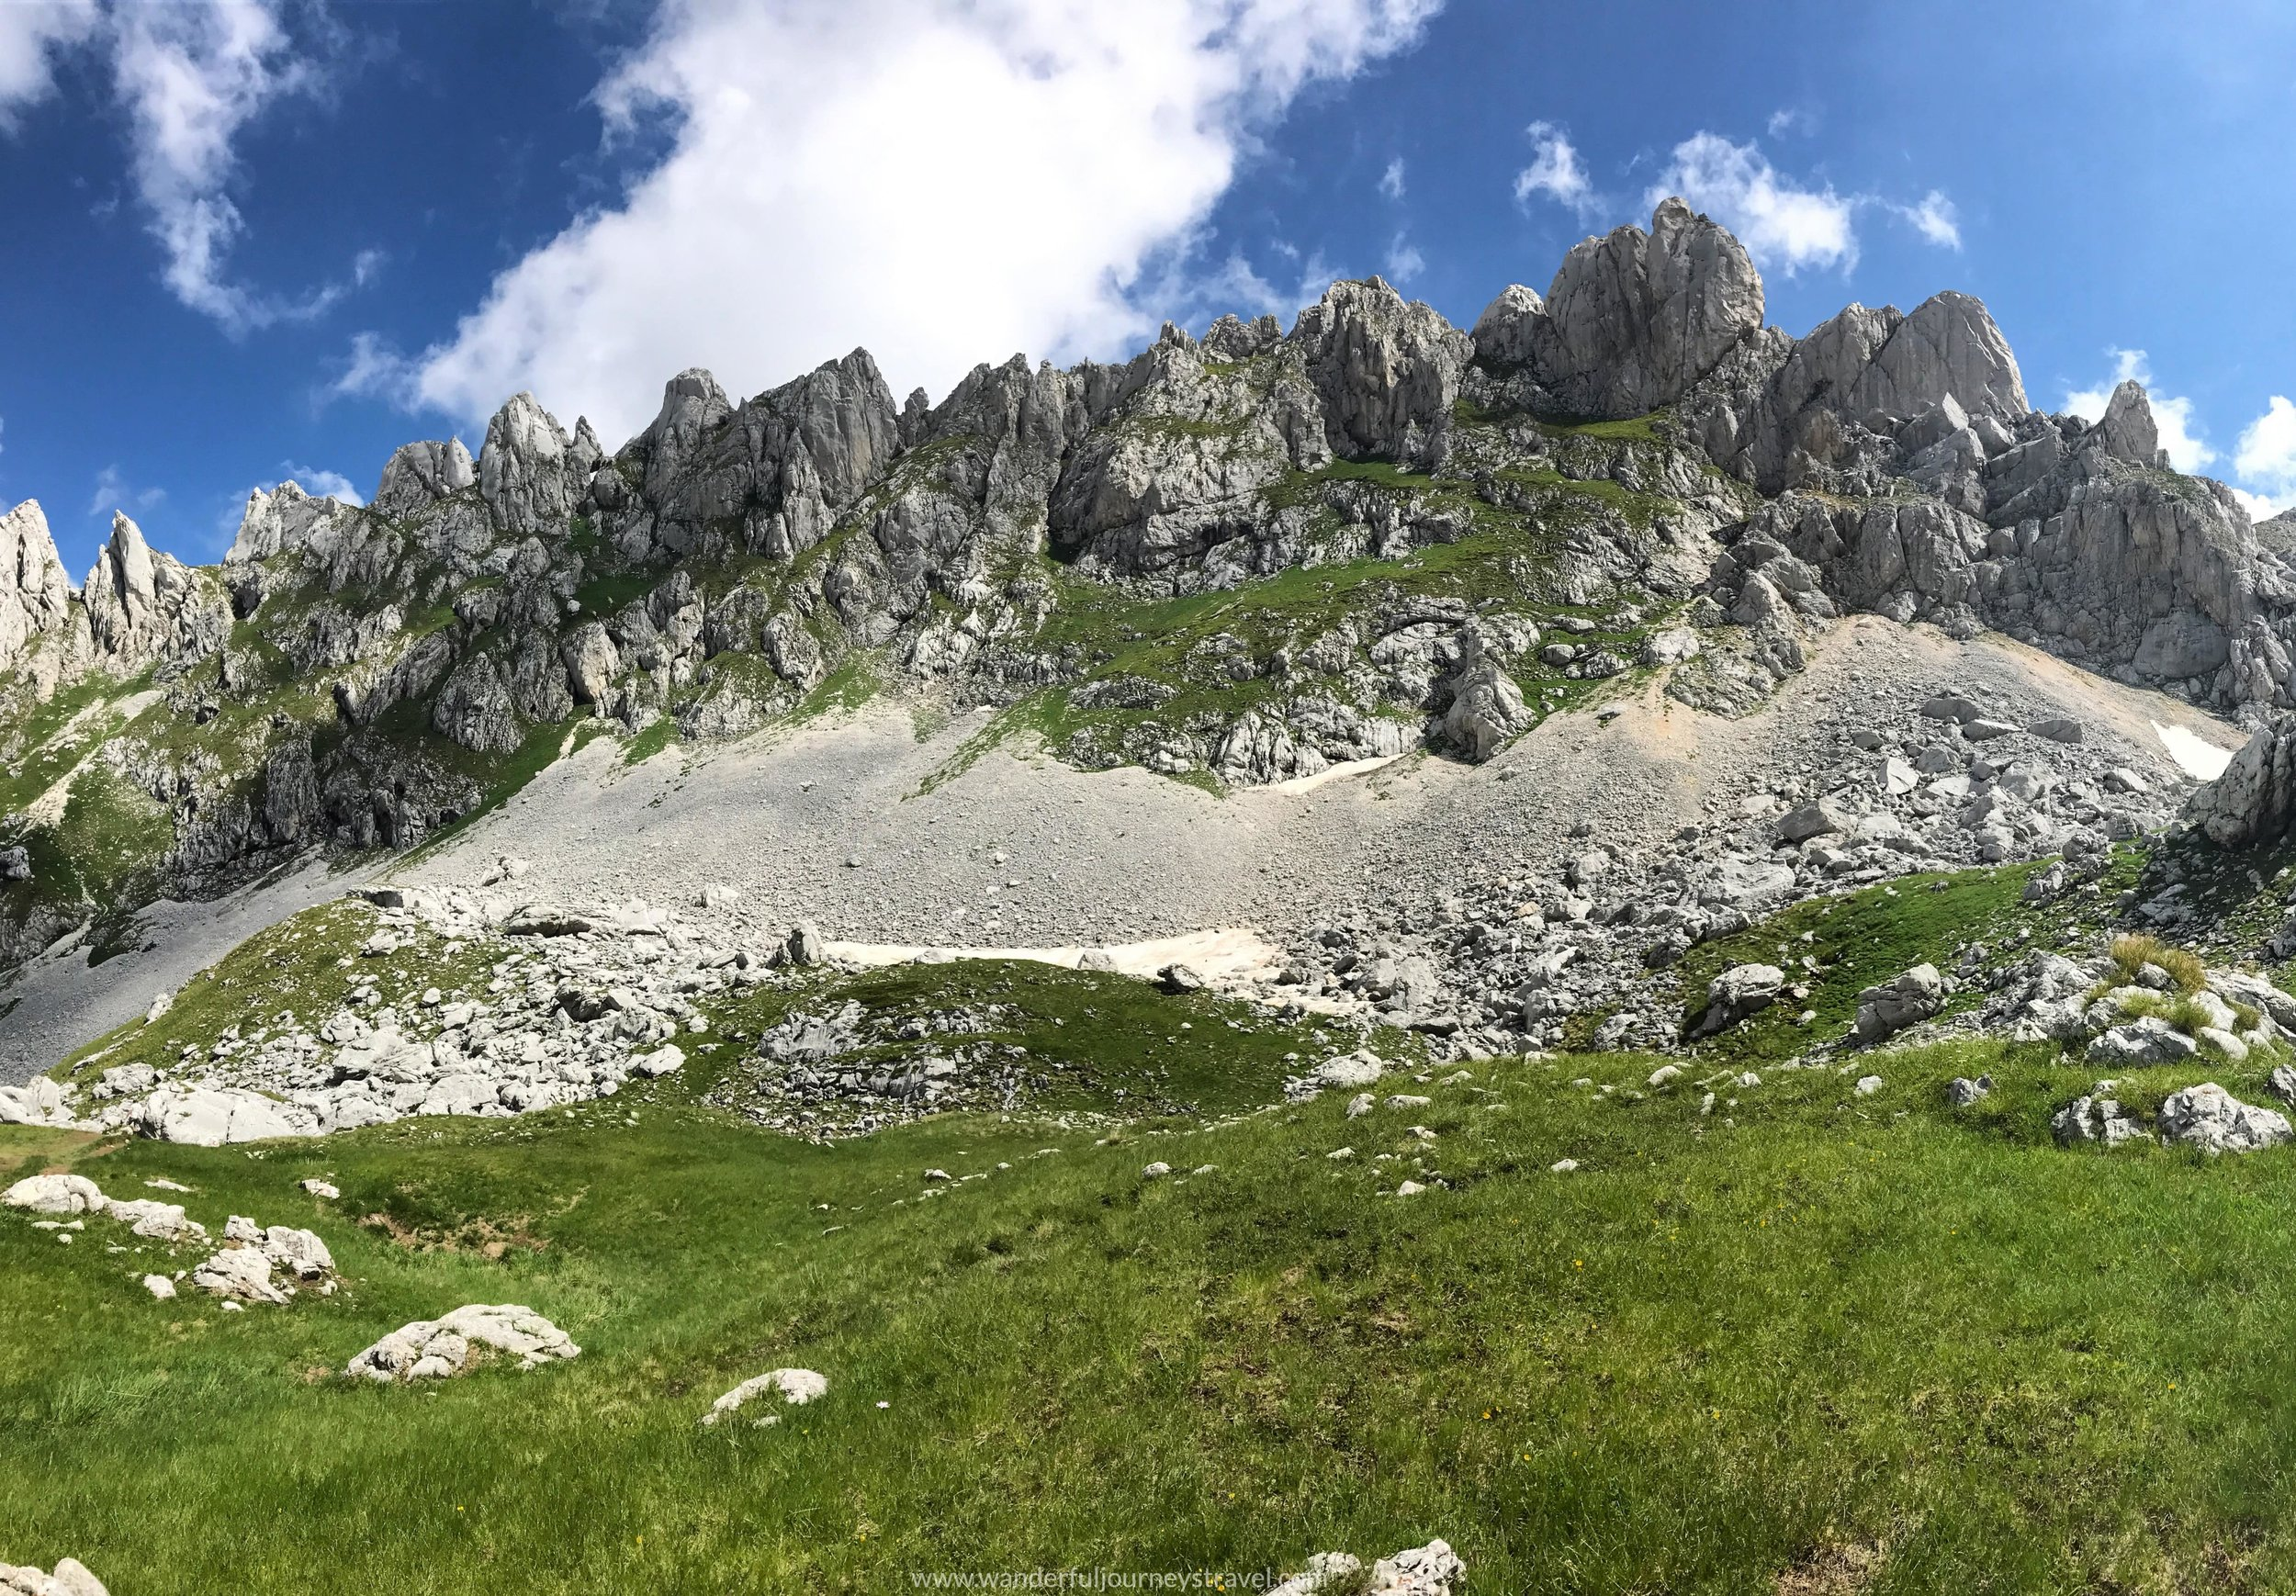 sedlo-trail-pano-view-bobotov-kuk-montenegro-durmitor.jpg